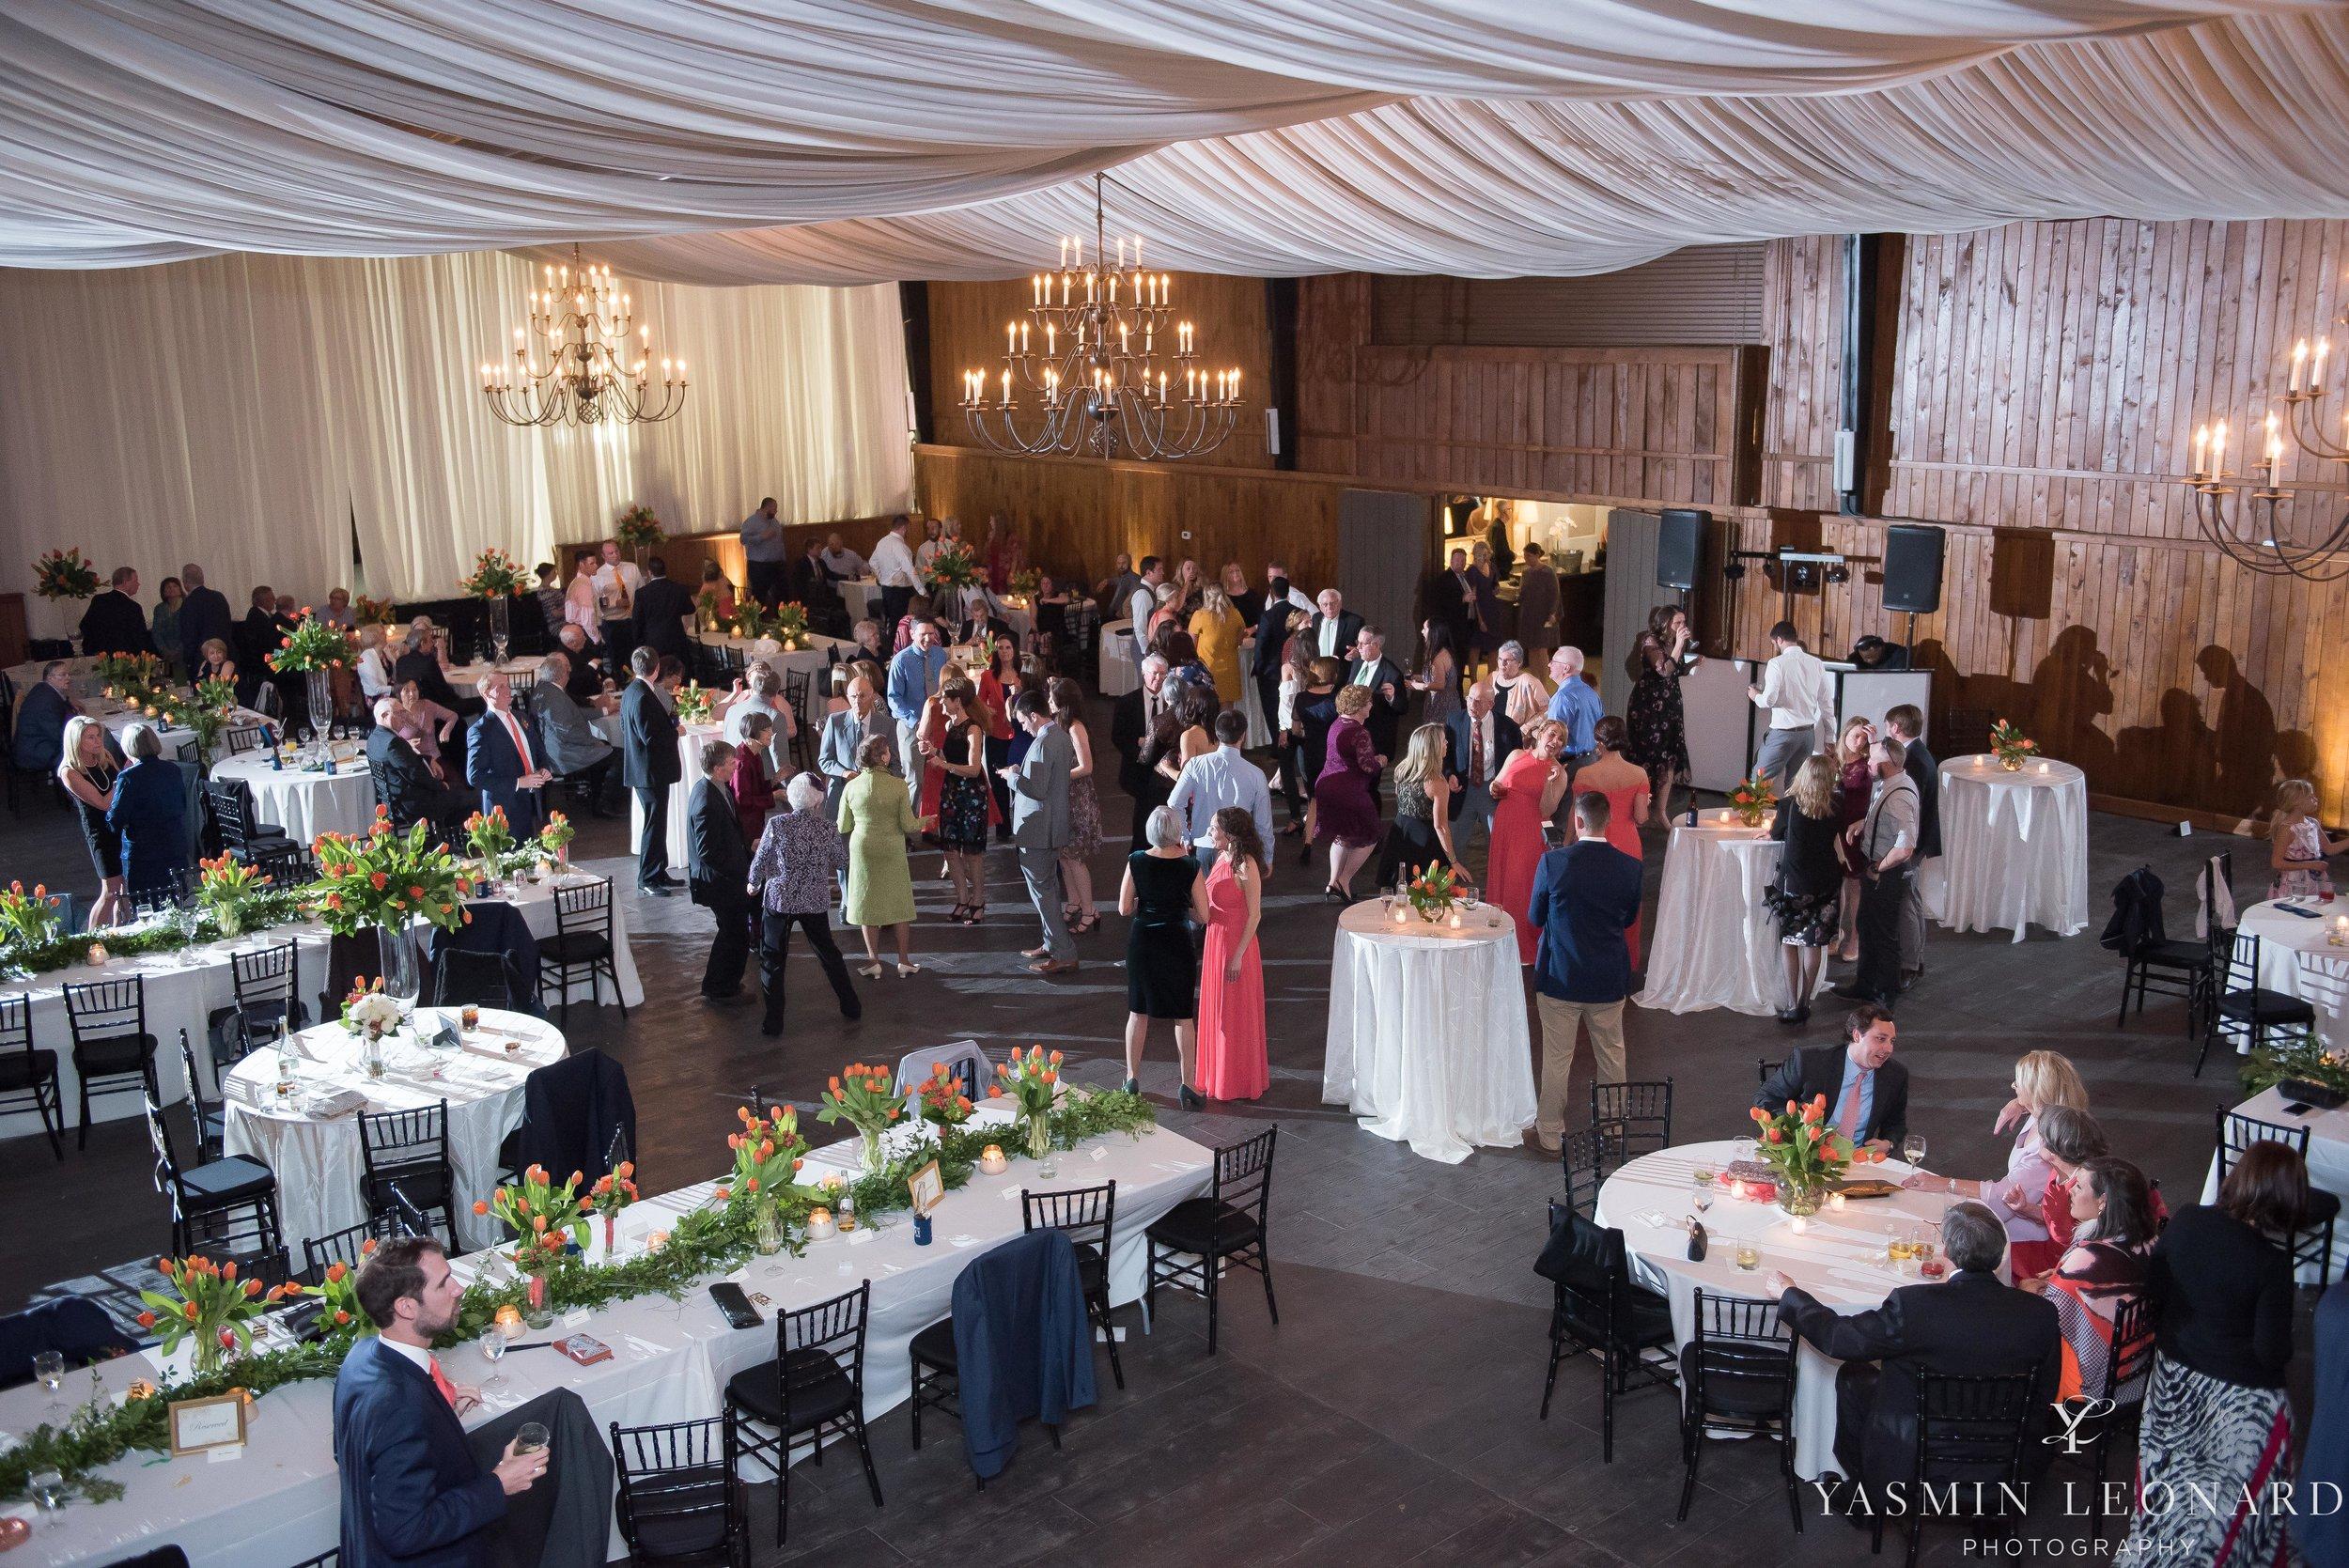 Adaumont Farm - Adaumont Farm Weddings - Trinity Weddings - NC Weddings - Yasmin Leonard Photography-77.jpg